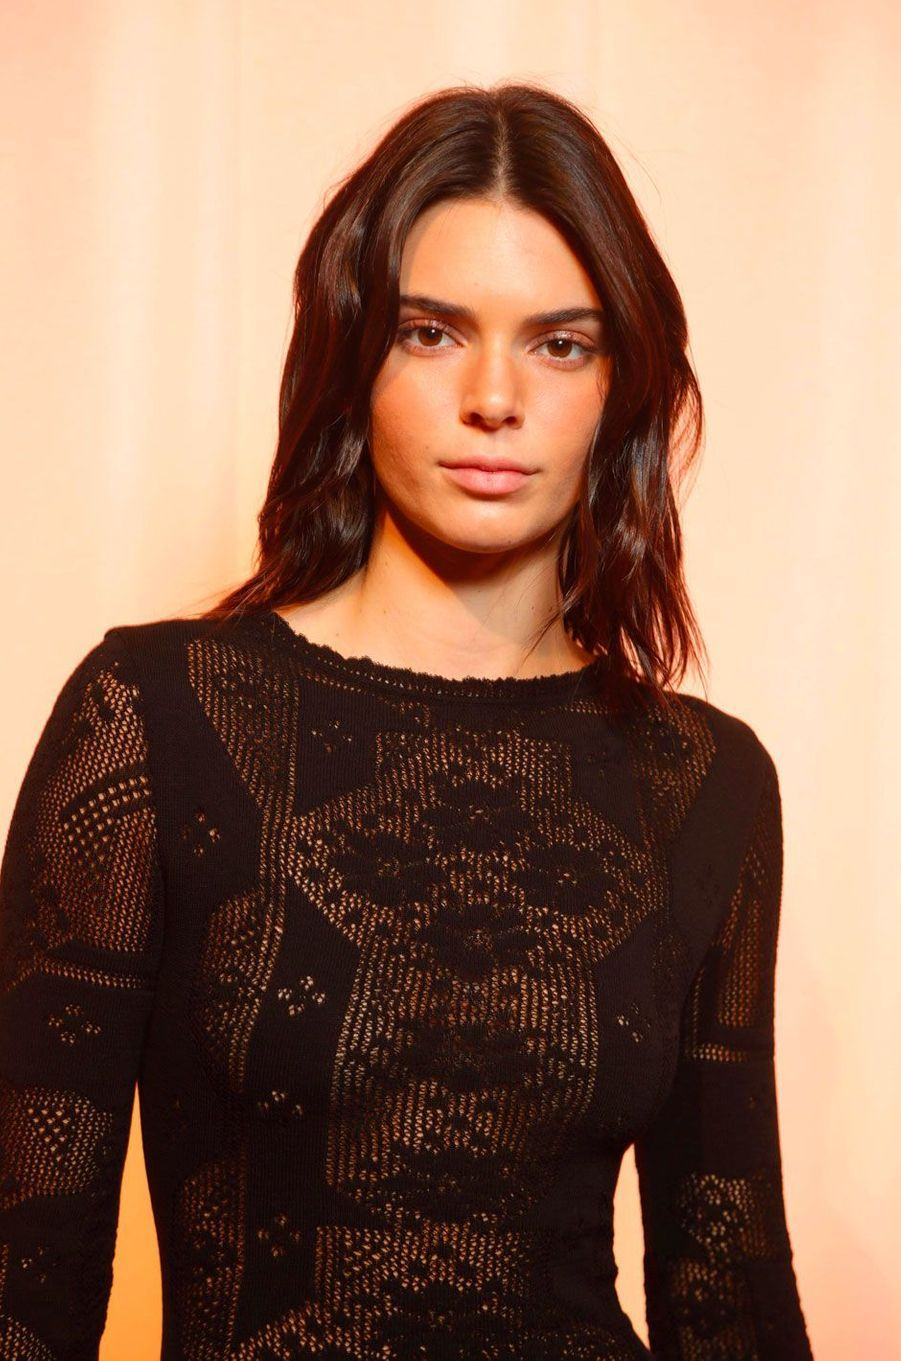 Kendall Jenner en backstage du défilé pour Alberta Ferretti, mercredi 19 septembre 2018 à Milan